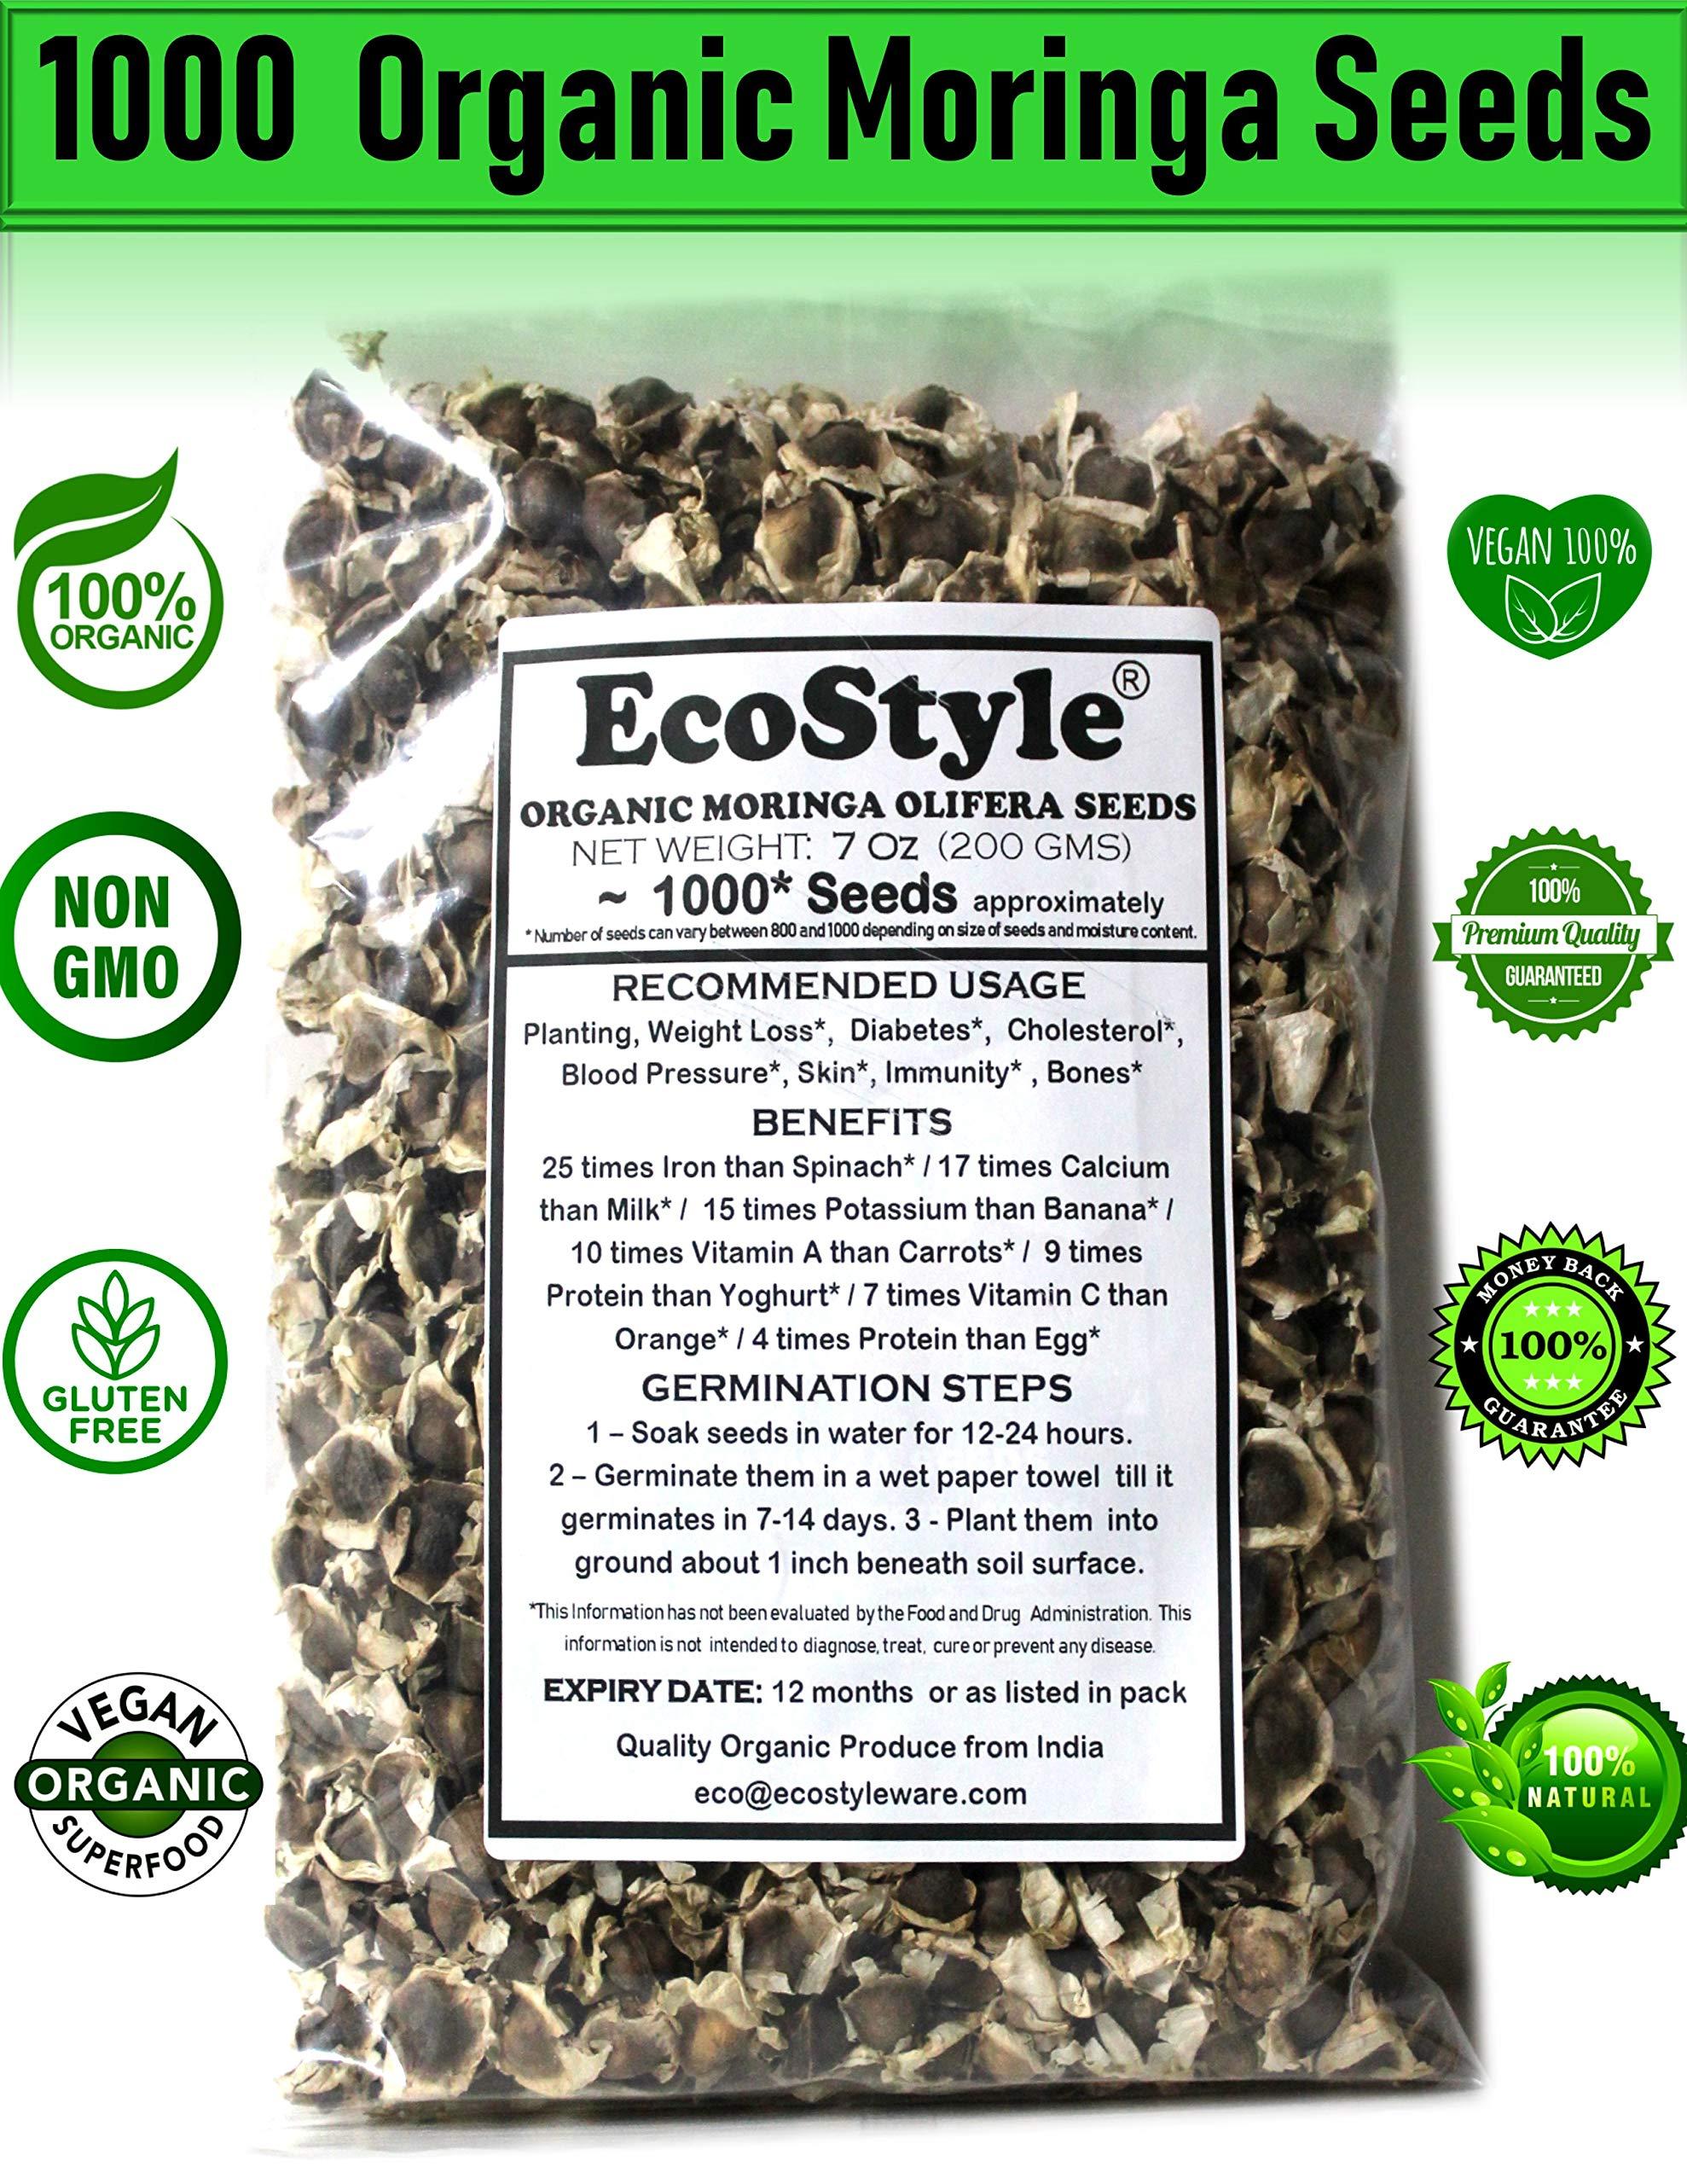 Ecostyle   Organic Moringa Seeds   1000 Seeds Approx.  Premium Quality   PKM1 Variety   200 GMS   Edible   Planting   Moringa Oleifera  Malunggay   Semillas De Moringa   Drumstick Tree   Non-GMO ! by Ecostyle